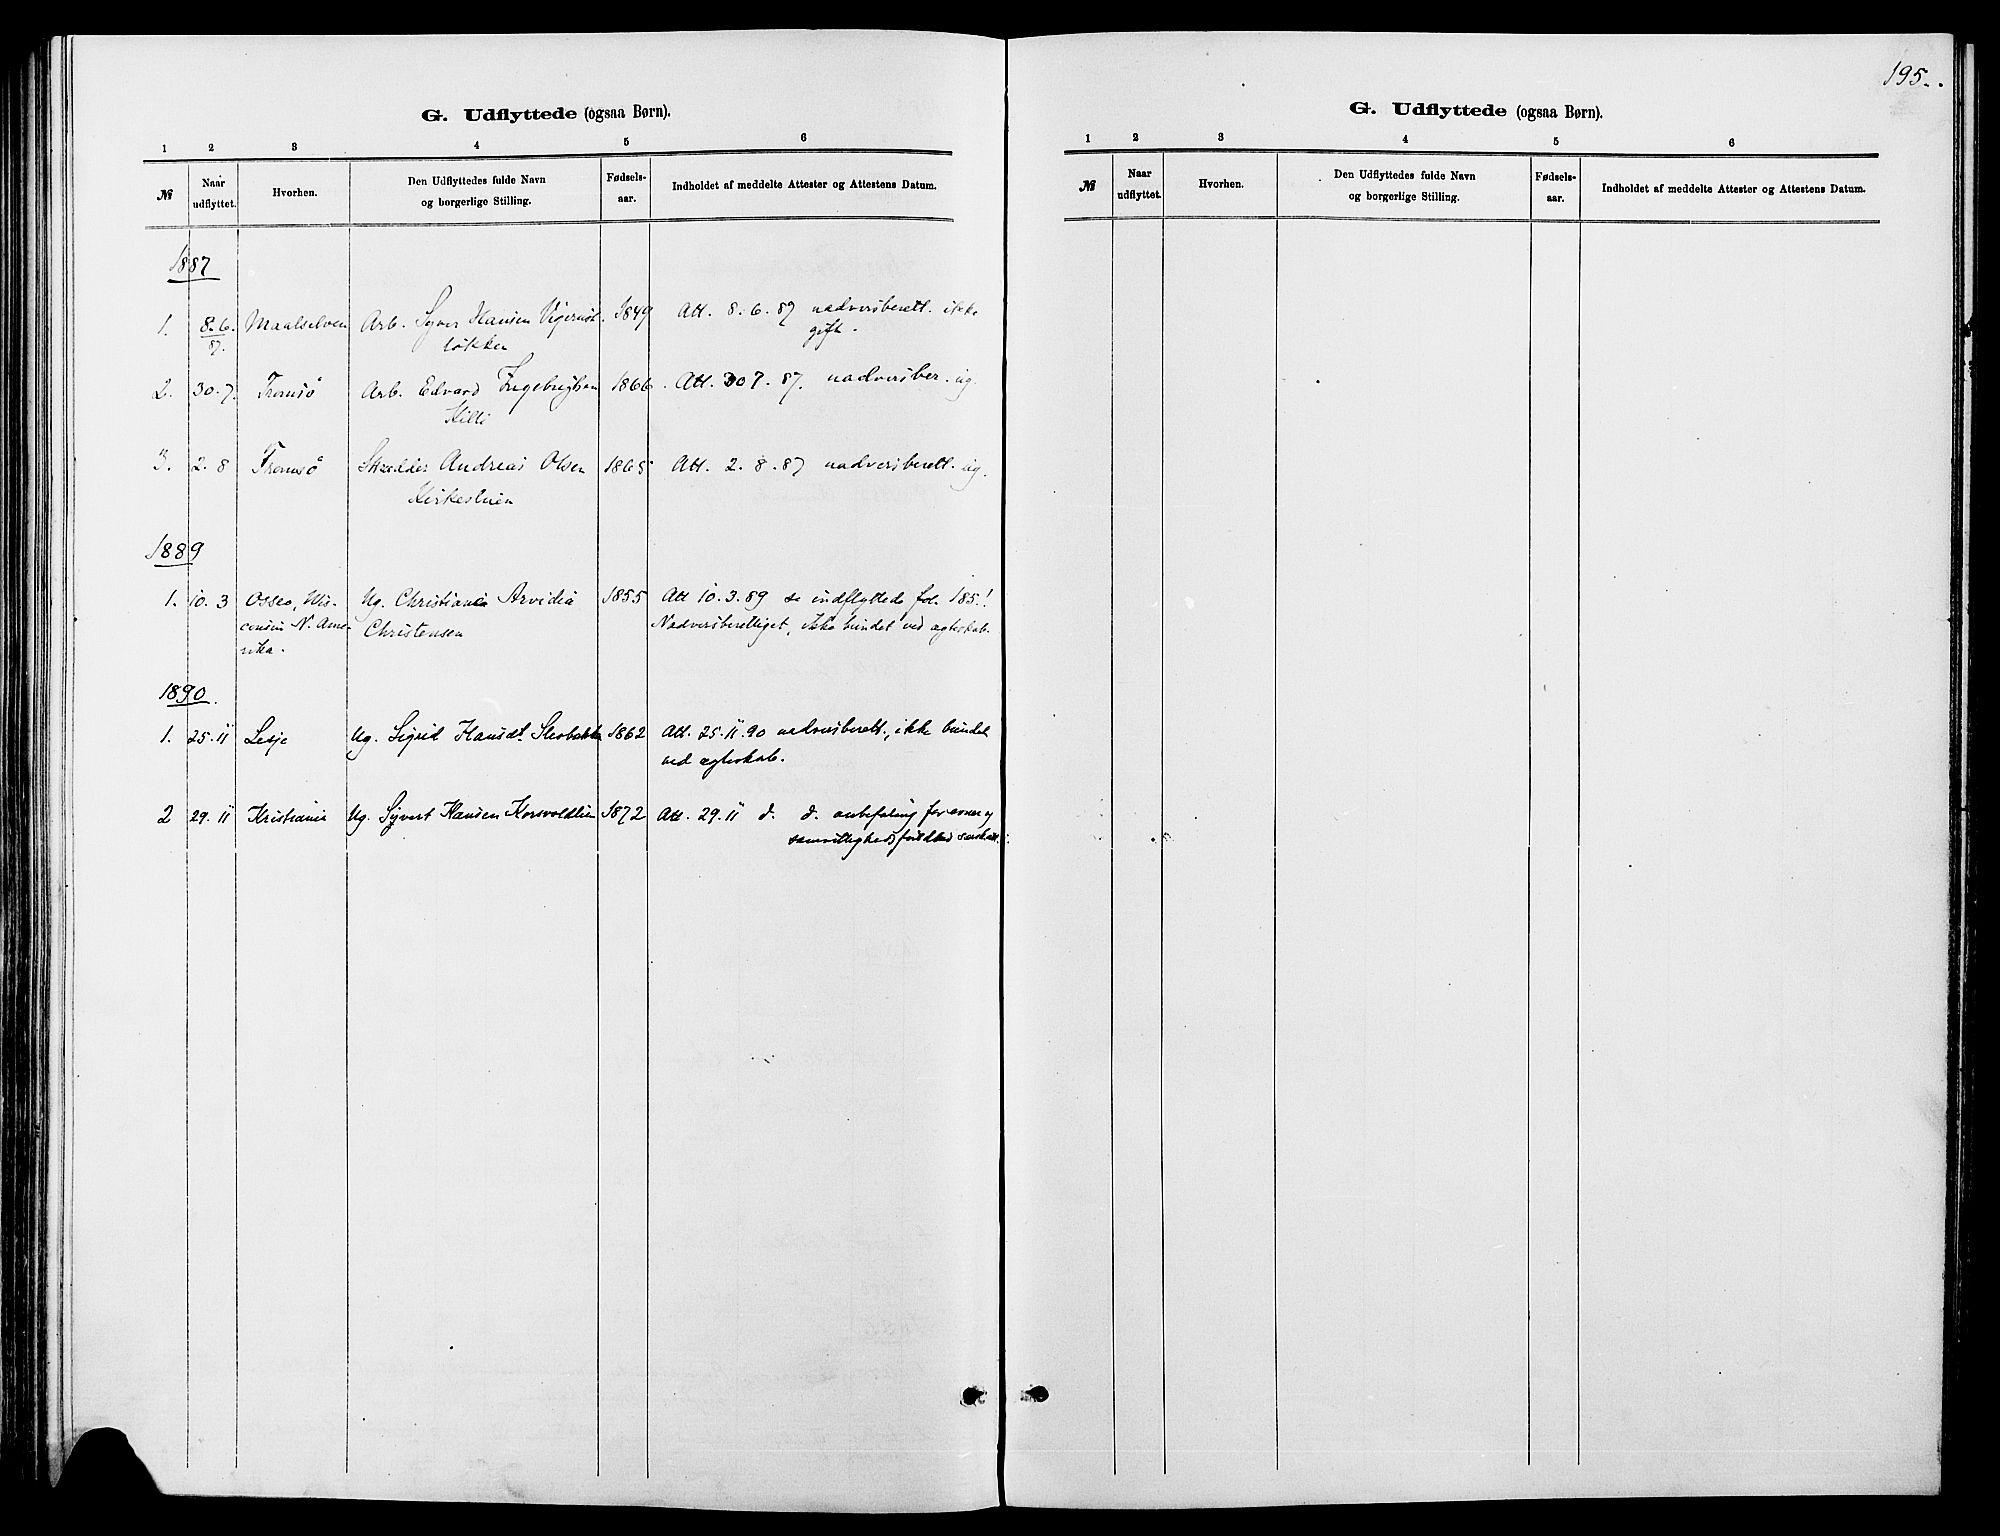 SAH, Dovre prestekontor, Ministerialbok nr. 2, 1879-1890, s. 195